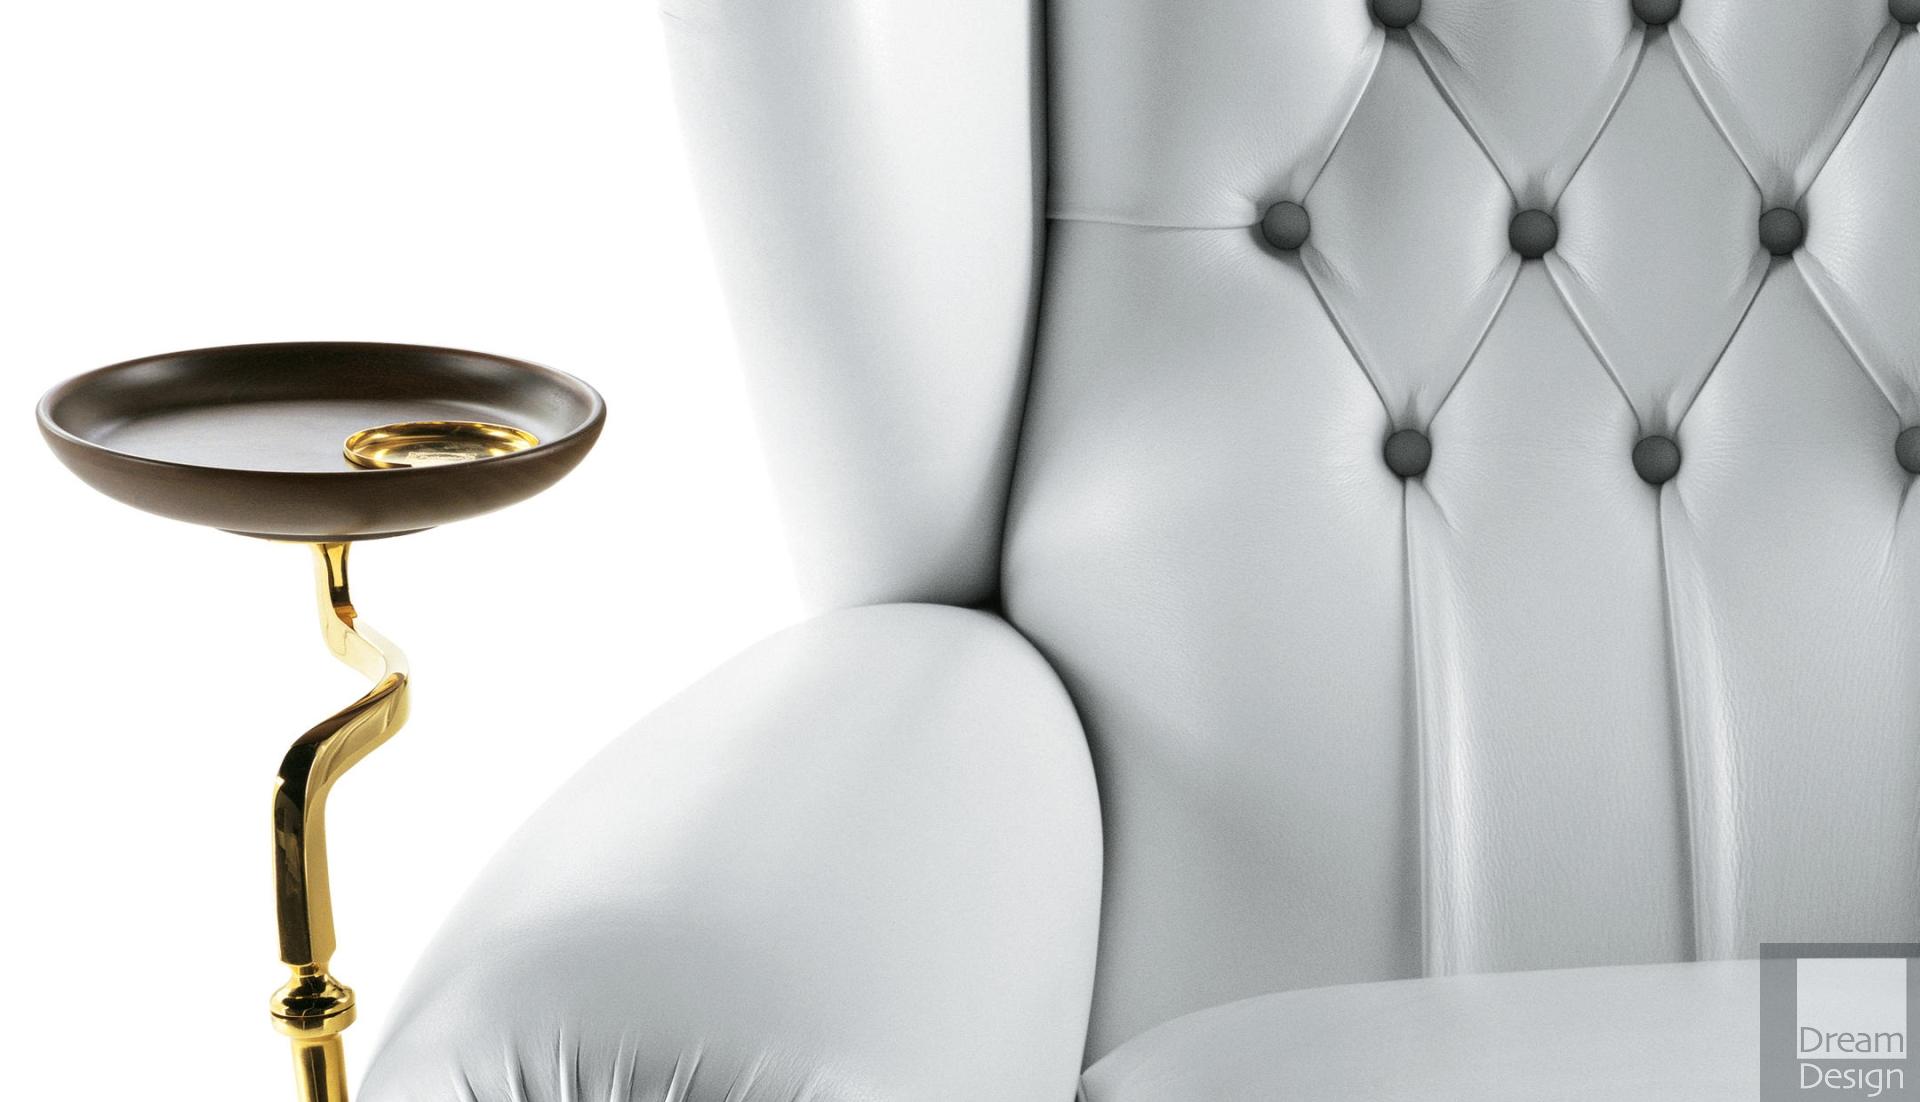 Poltrona Frau 1919 Armchair by Renzo Frau - Everything But Ordinary